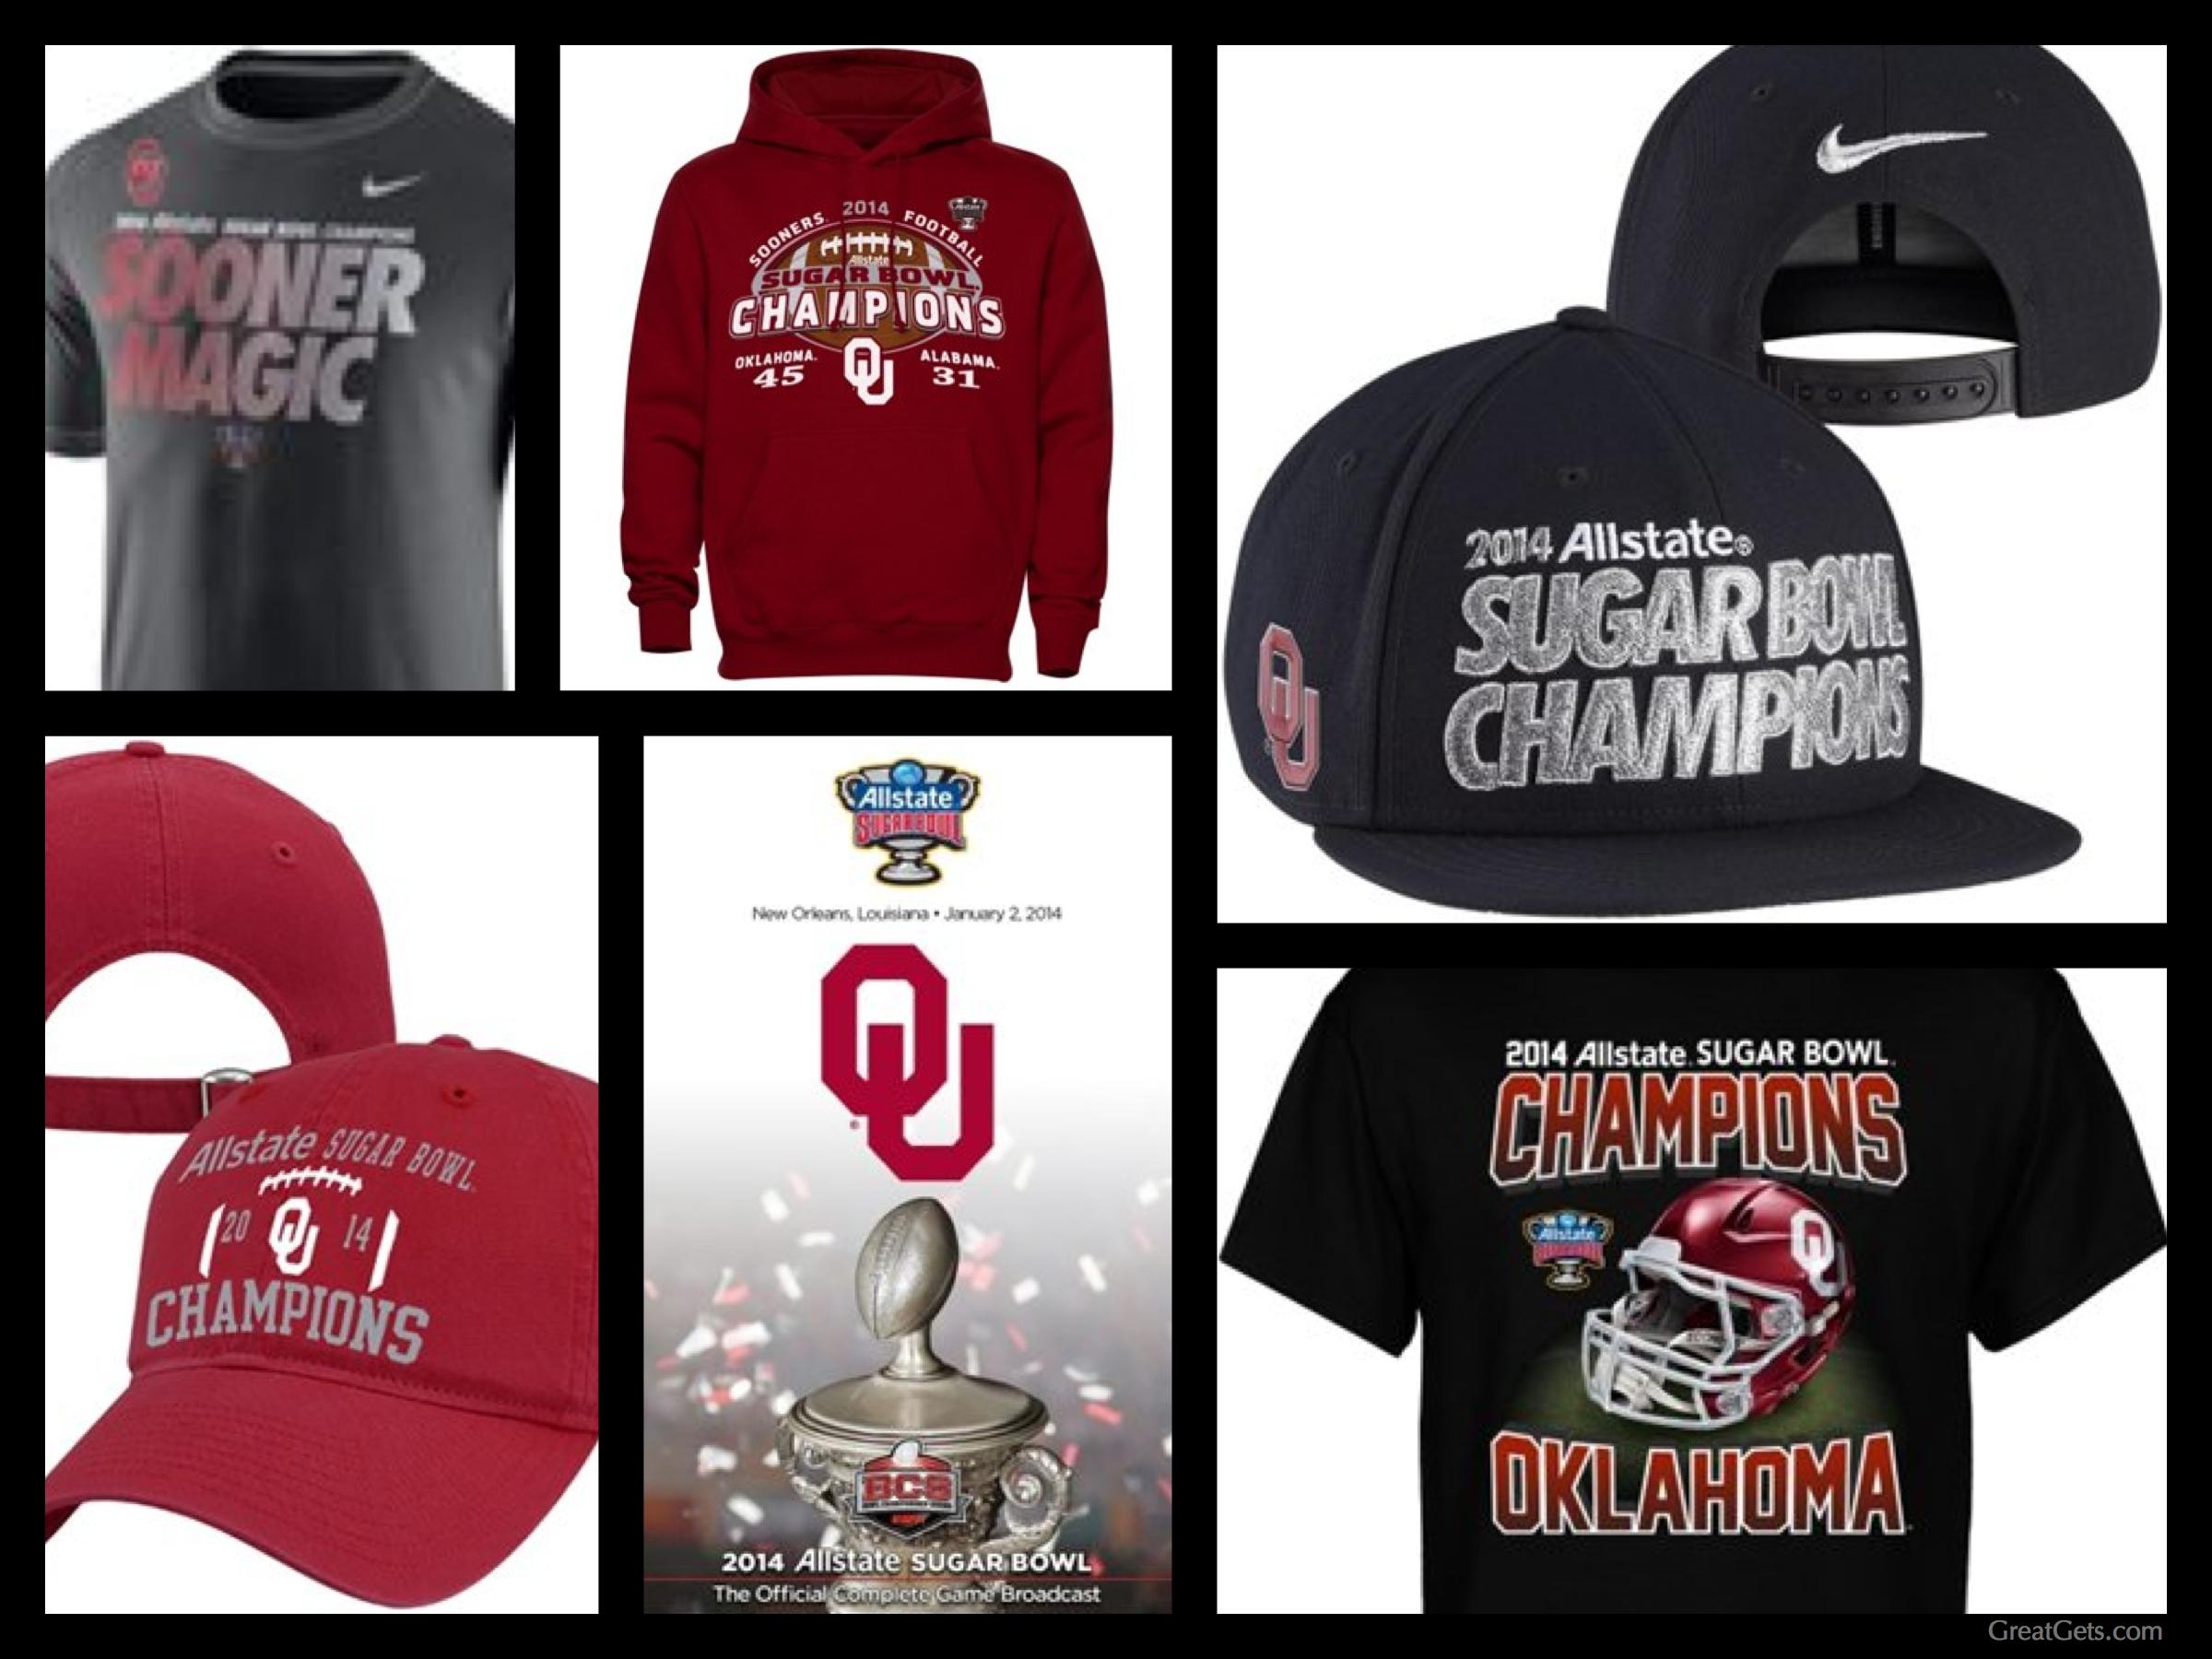 Oklahoma Sooners 2014 Sugar Bowl Championship Gear